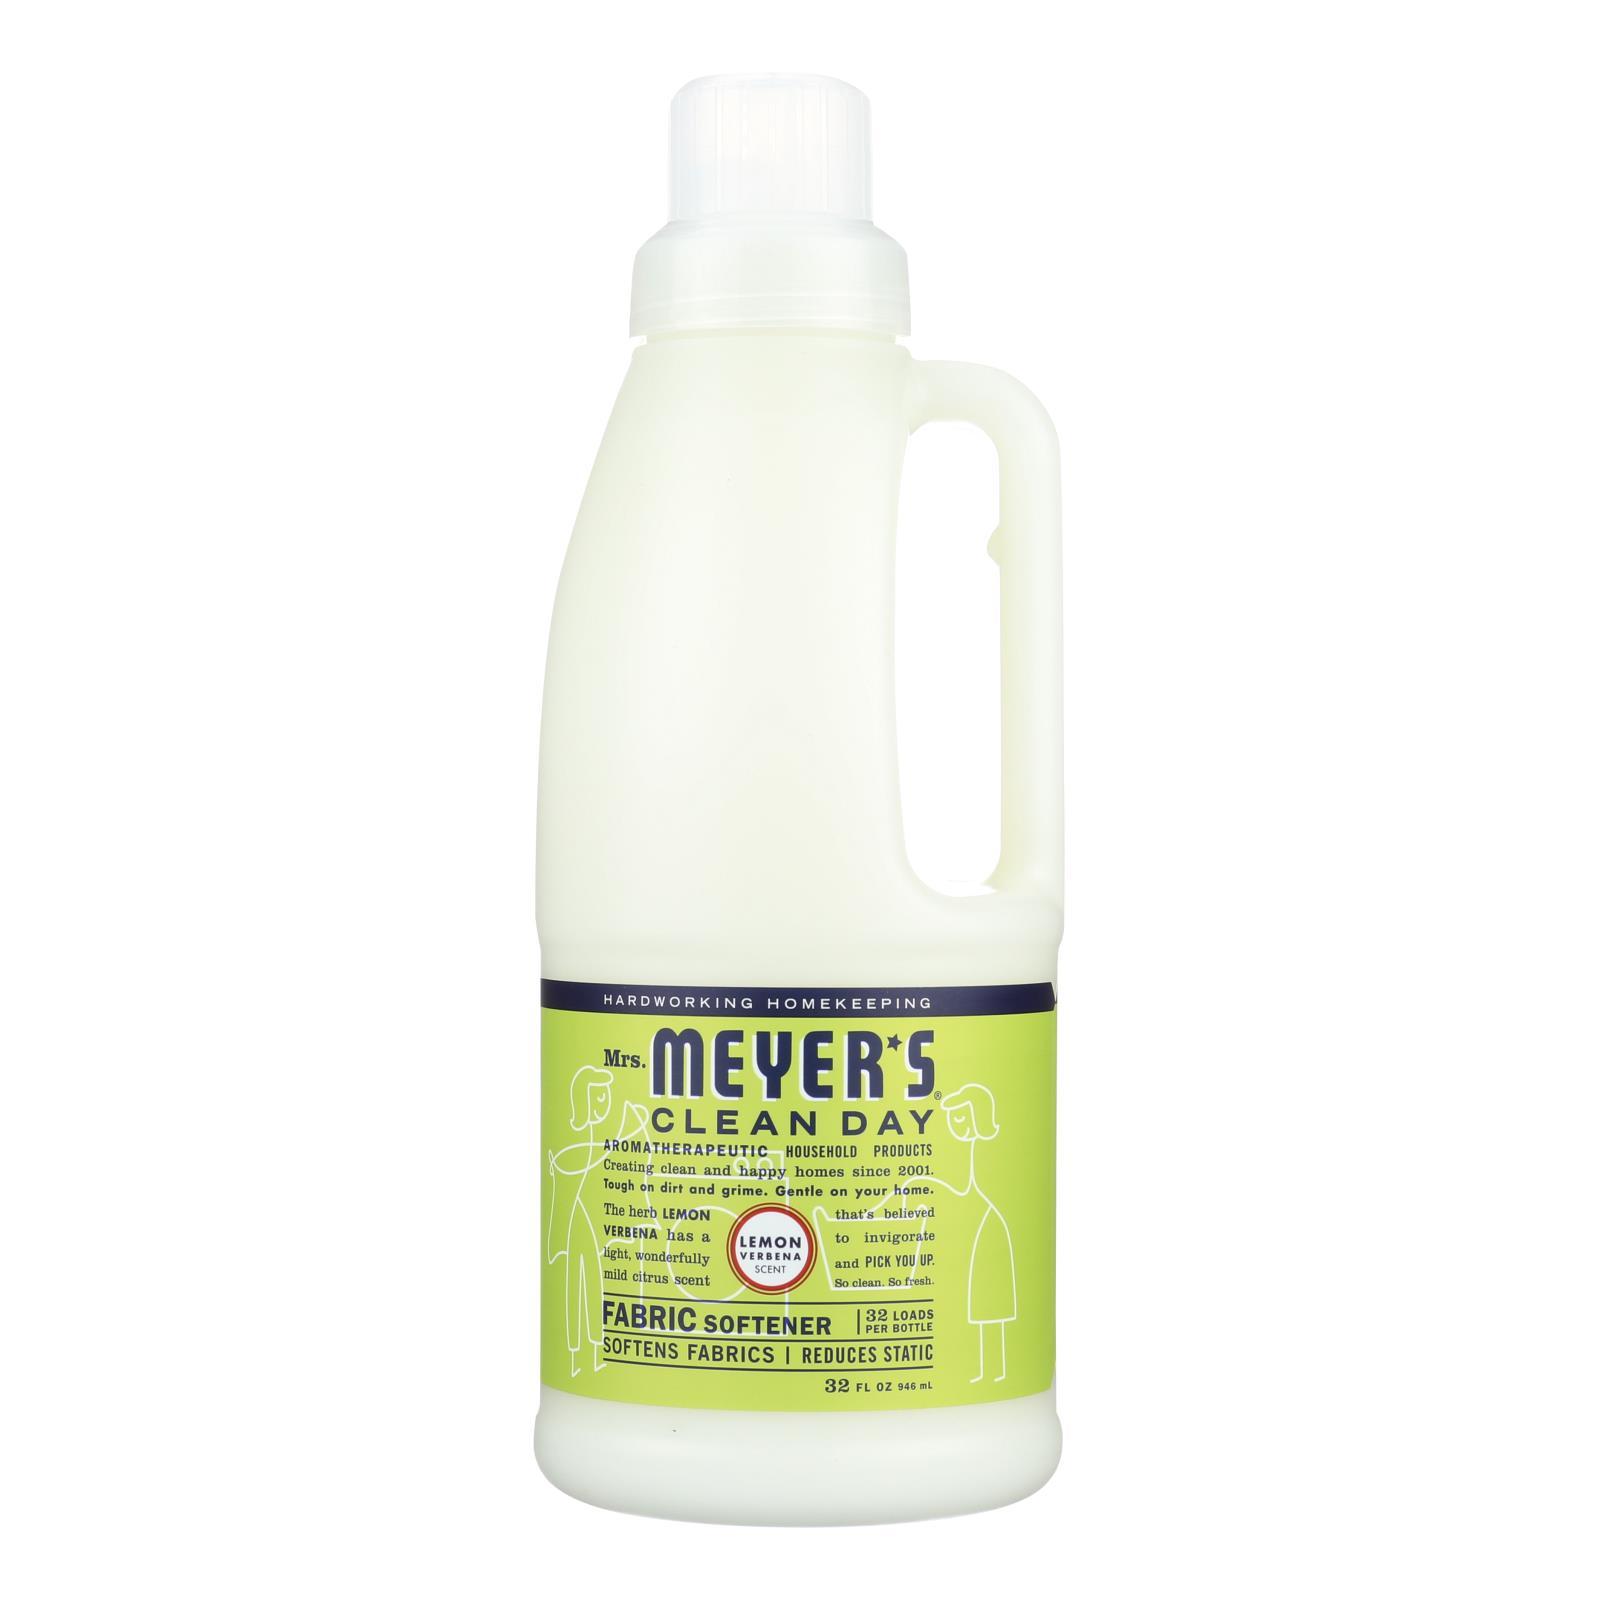 Mrs. Meyer's Clean Day - Fabric Softener - Lemon Verbena - Case of 6 - 32 oz